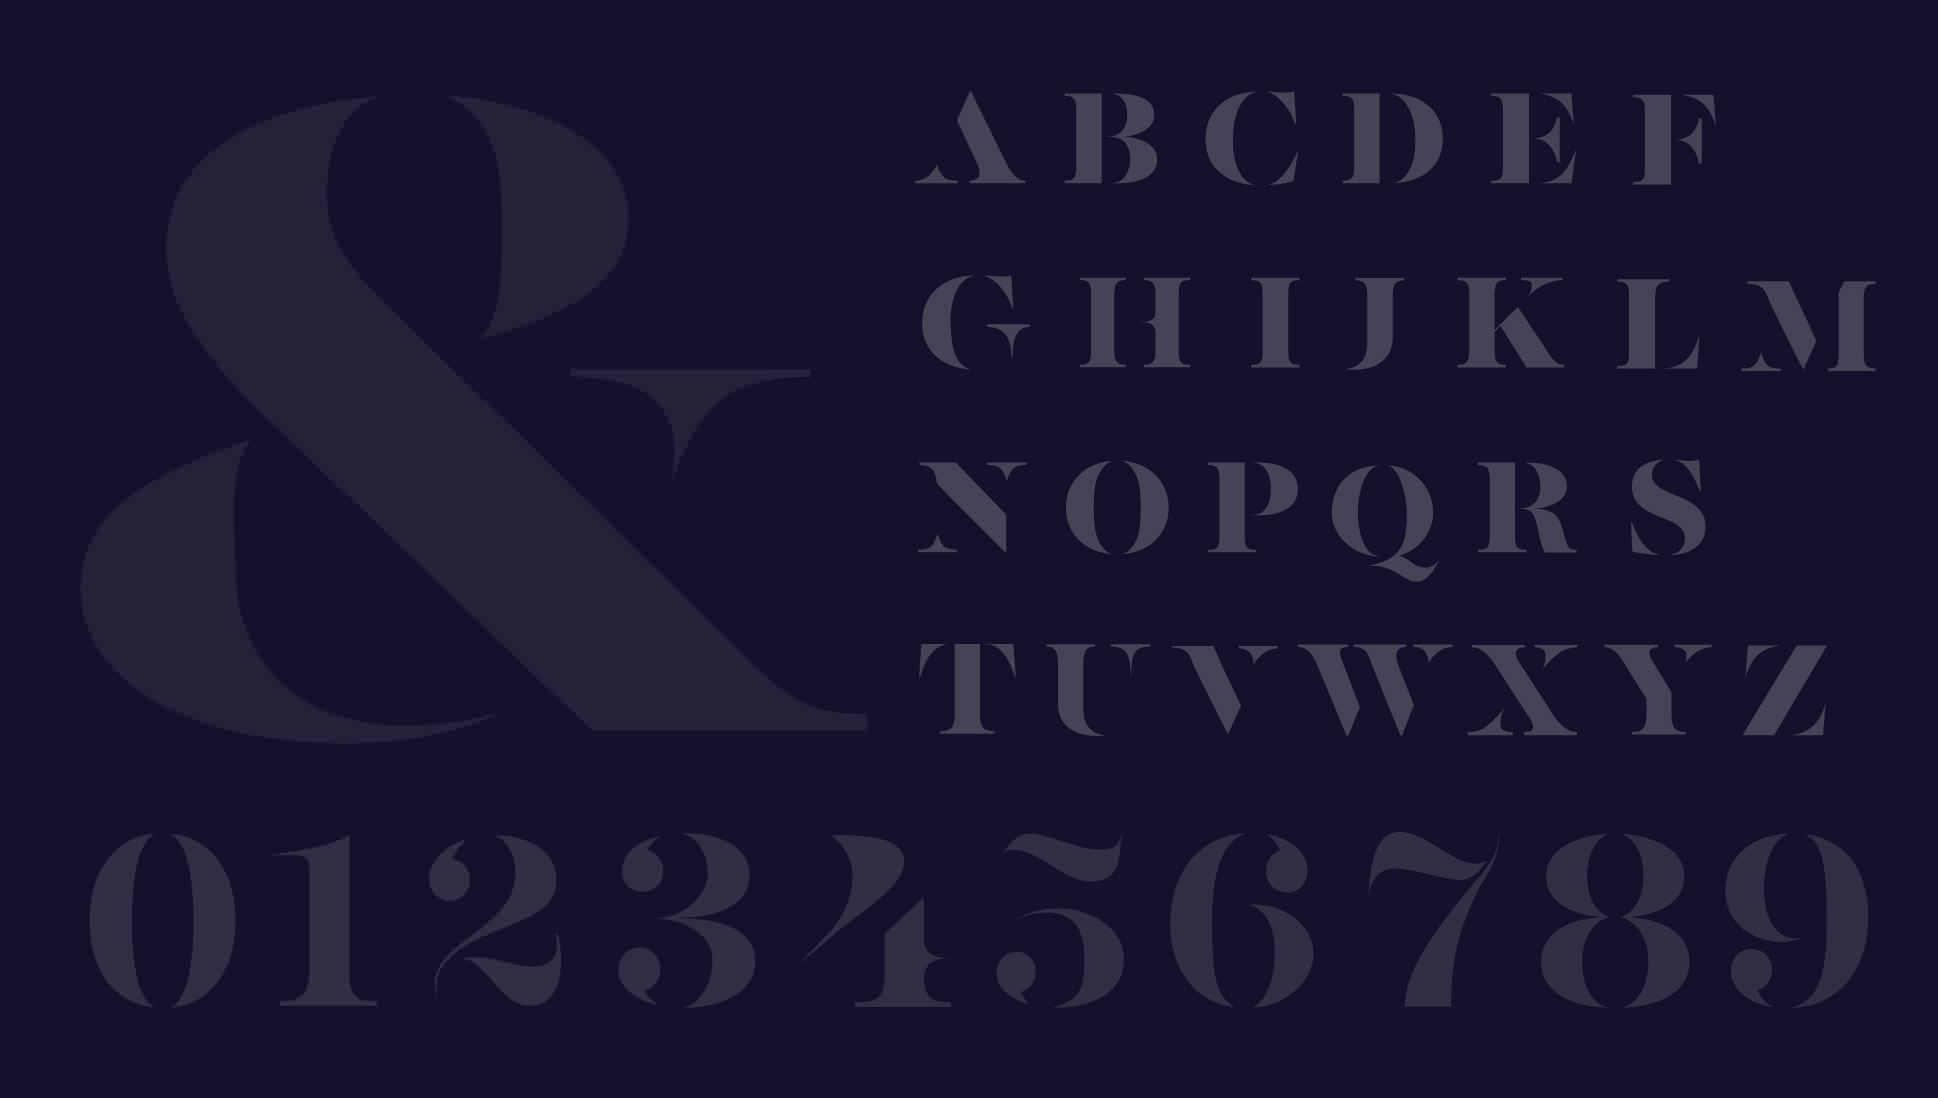 Custom Type Design